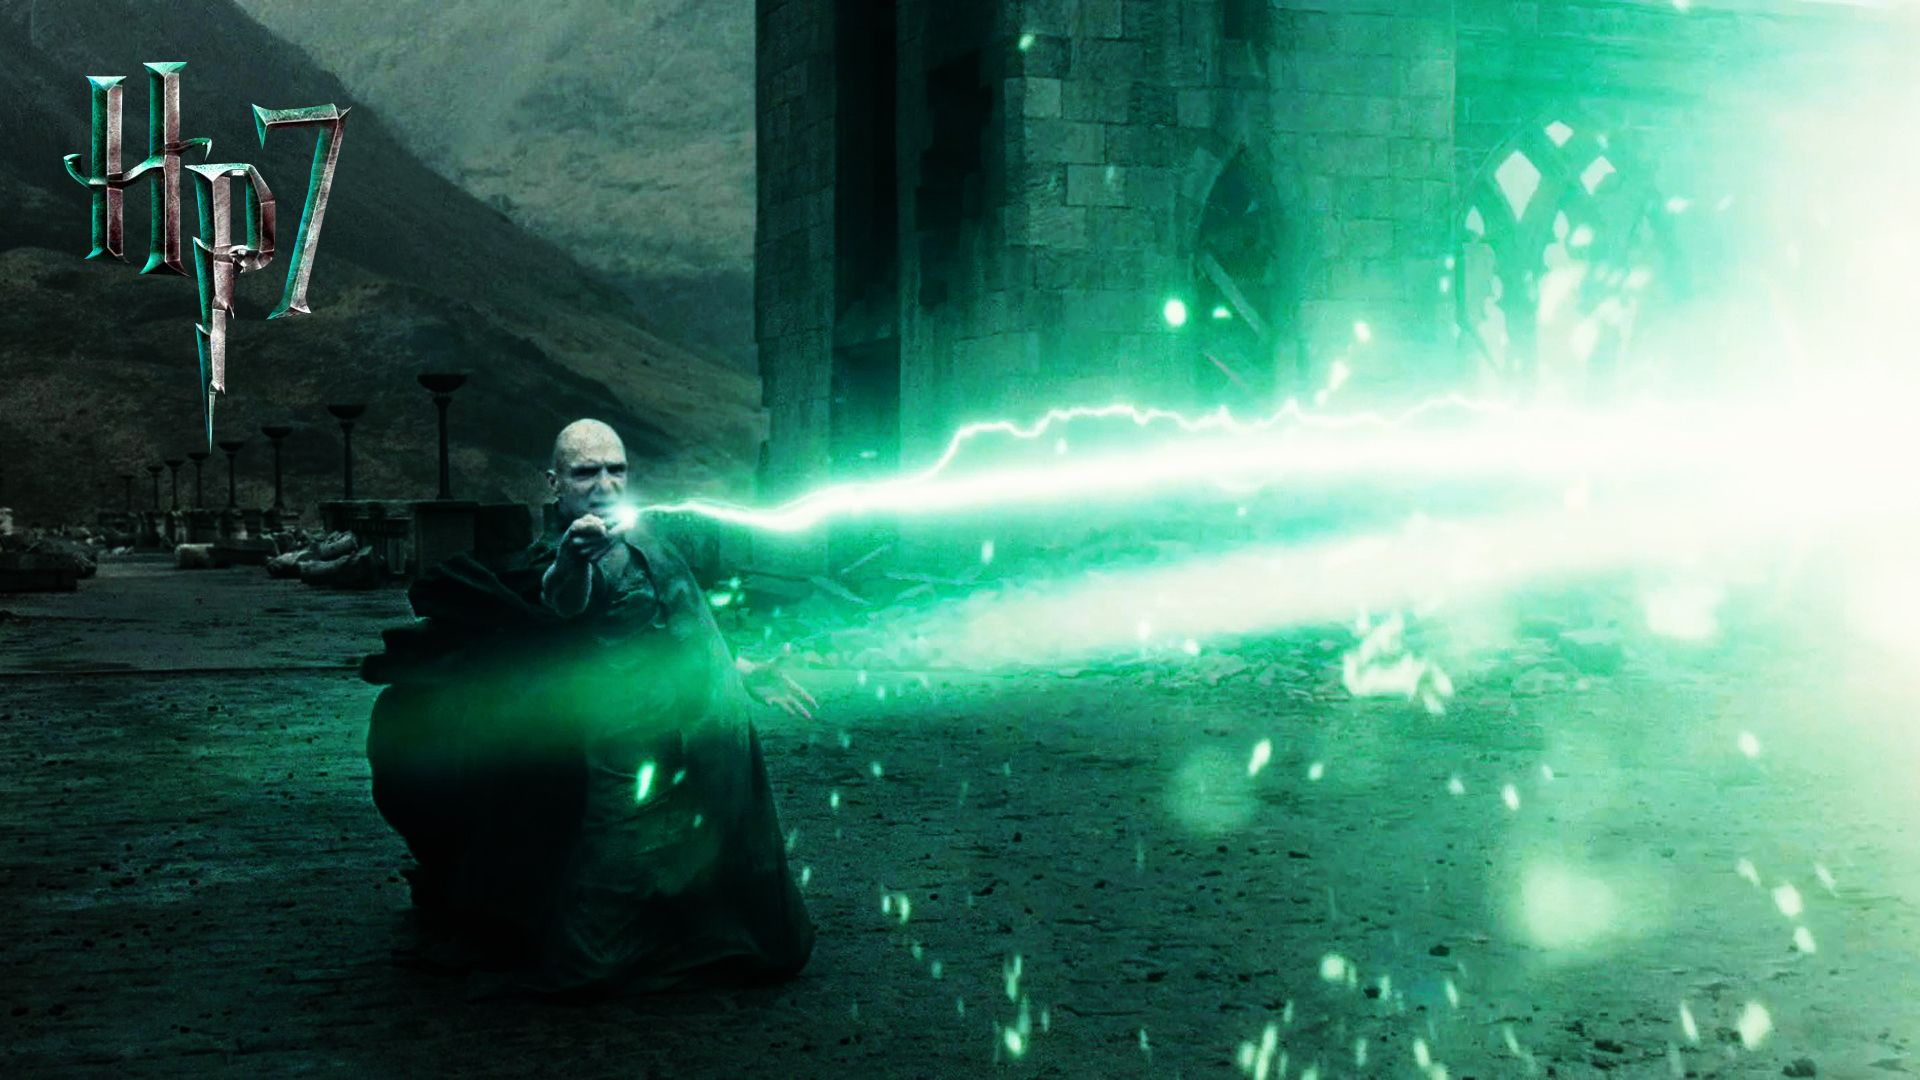 Magic Avada Kedavra Harrypotter Harry Potter Harry Voldemort